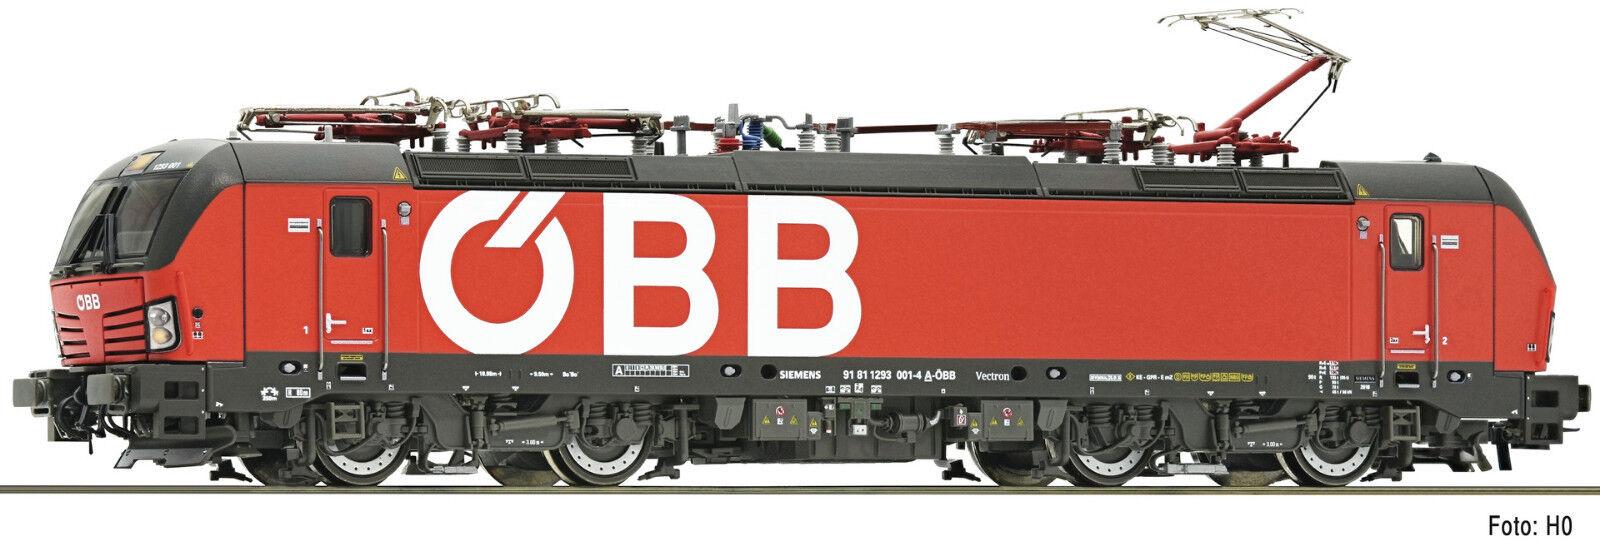 Fleischmann N 735 Locomotora Eléctrica Vectron 1293 ÖBB Ep Vi Nuevo Emb.